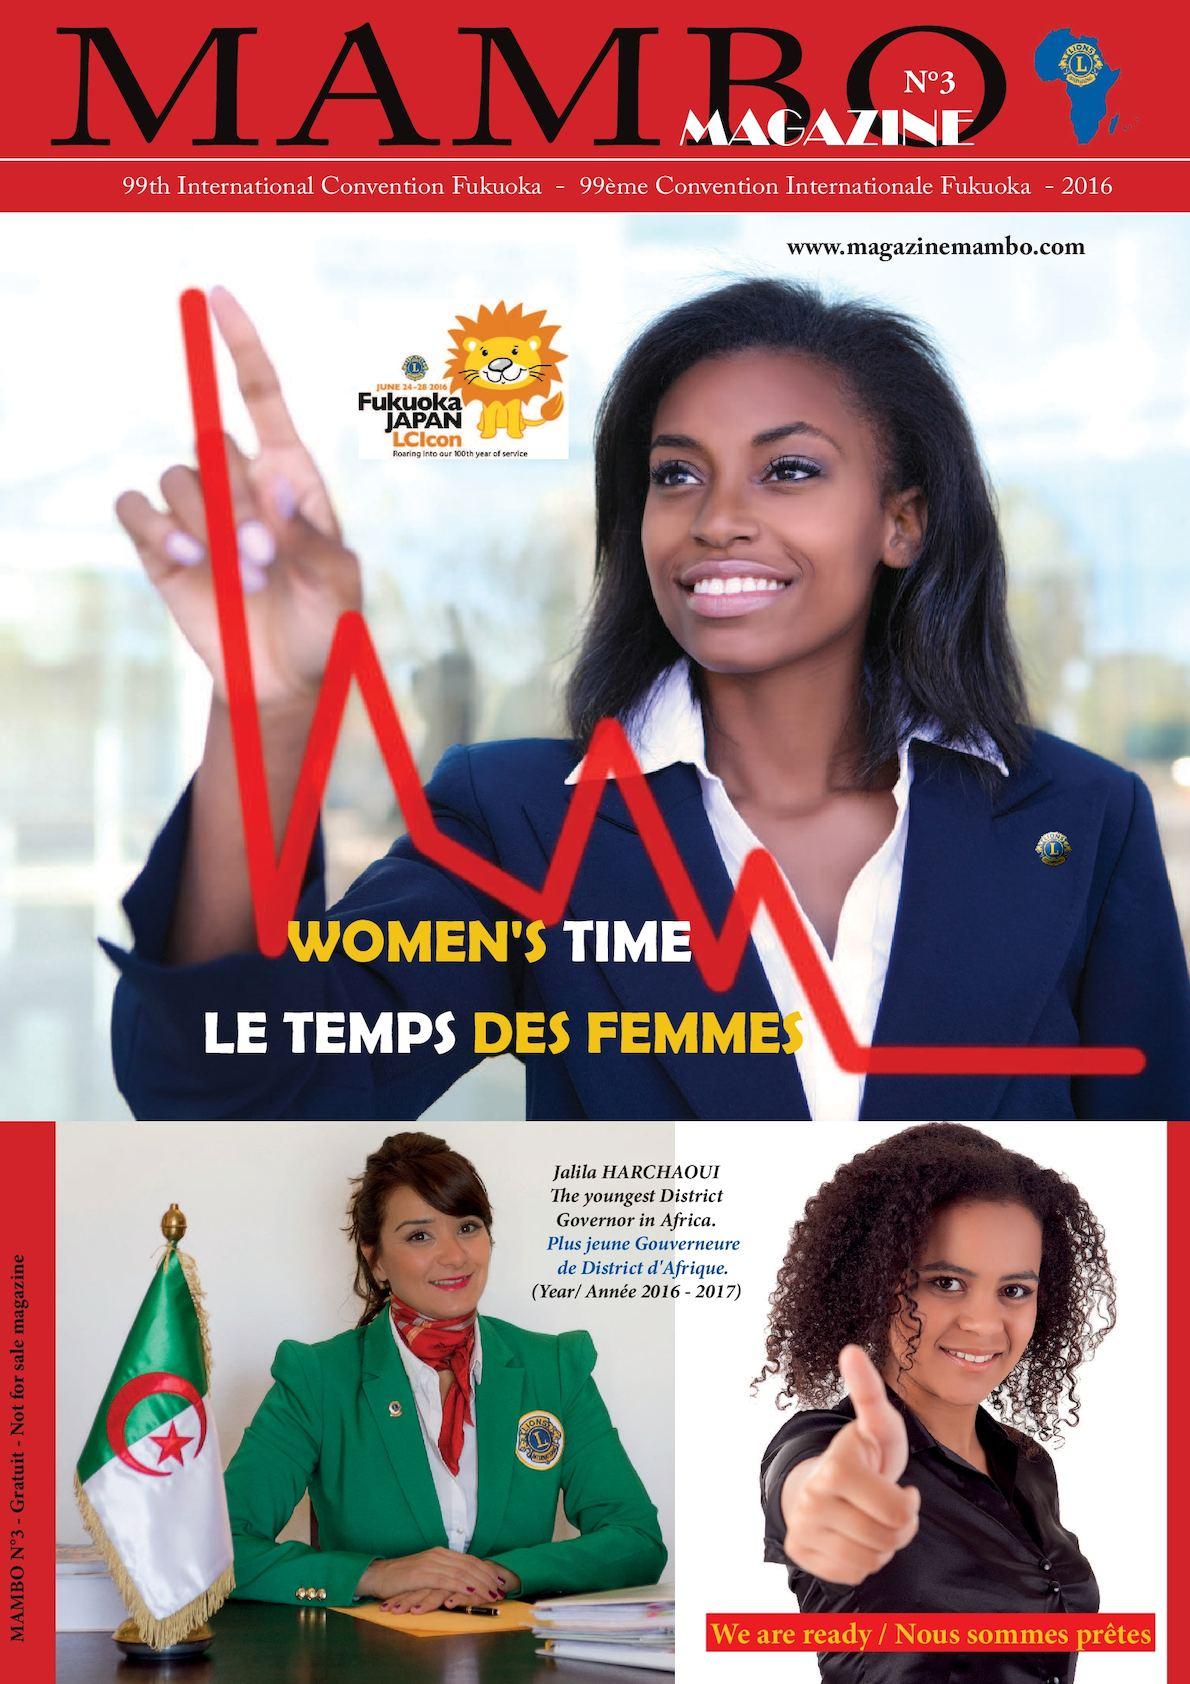 23ed5ea3317eea Calaméo - Mambo 3 - Le temps des Femmes - Women s Time